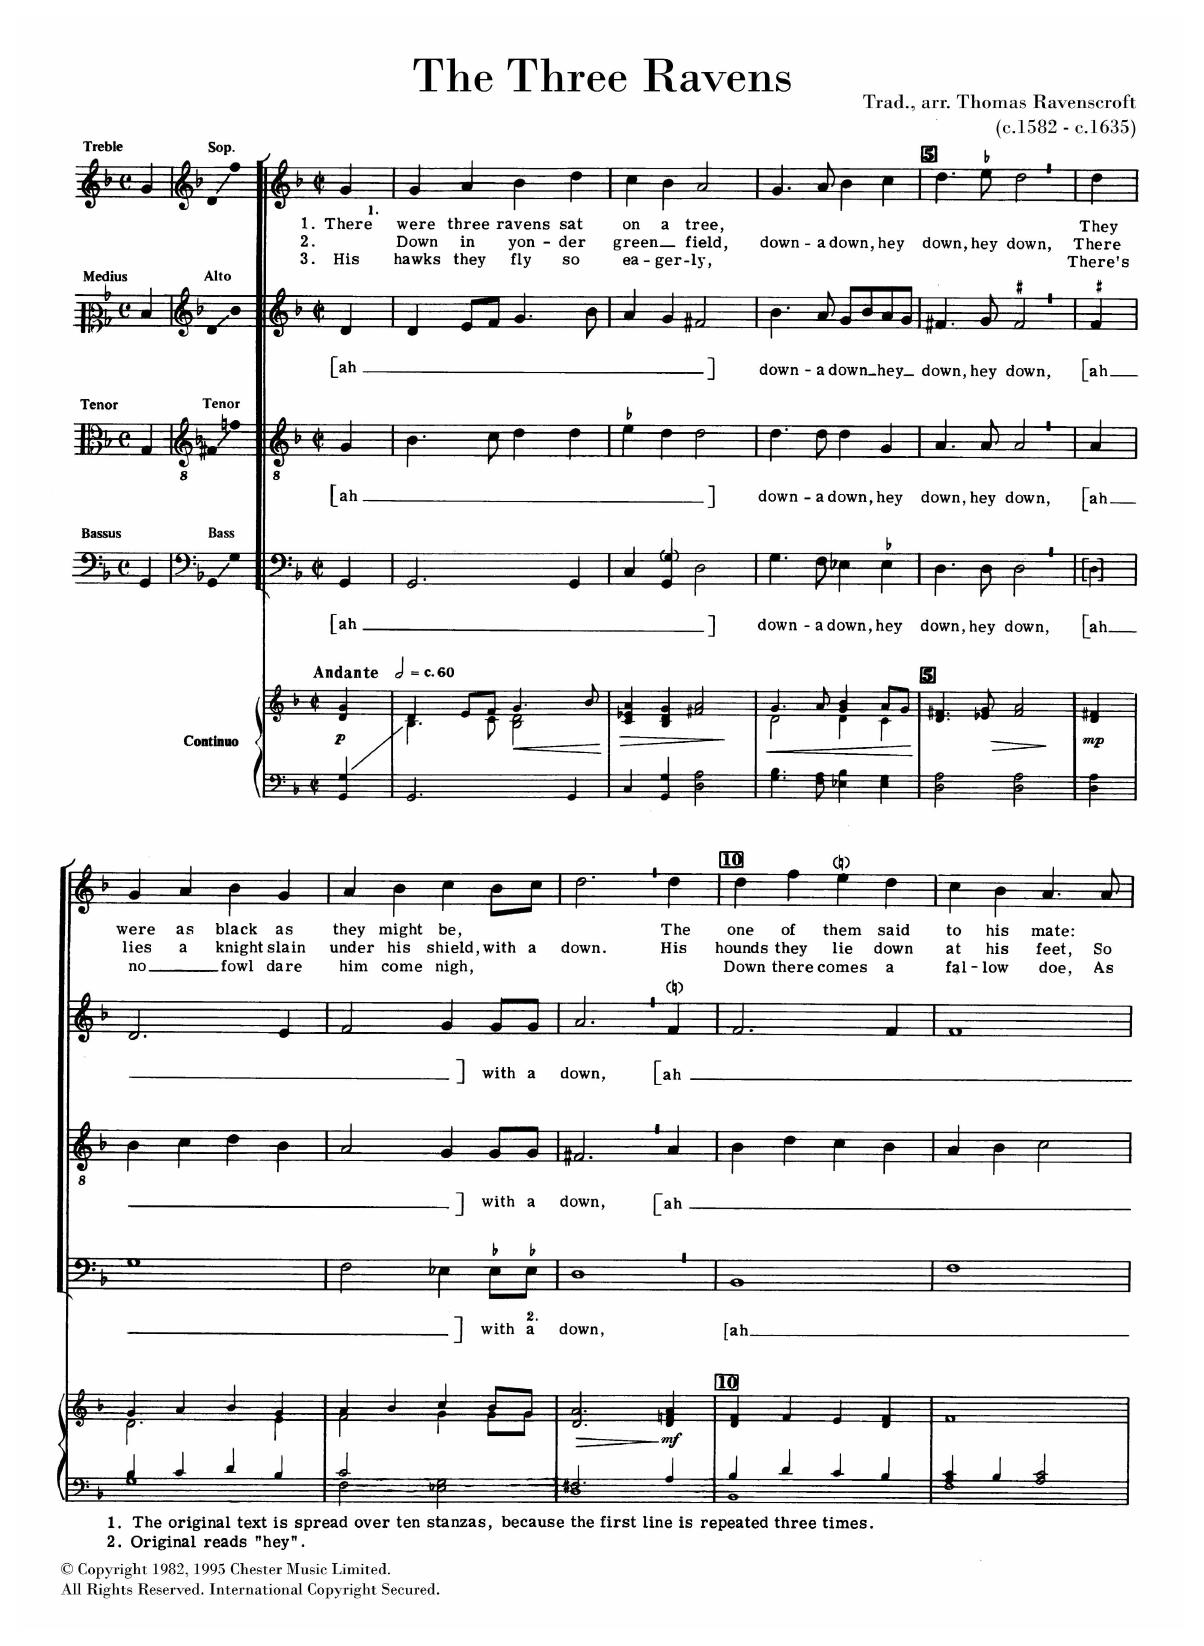 The Three Ravens Sheet Music